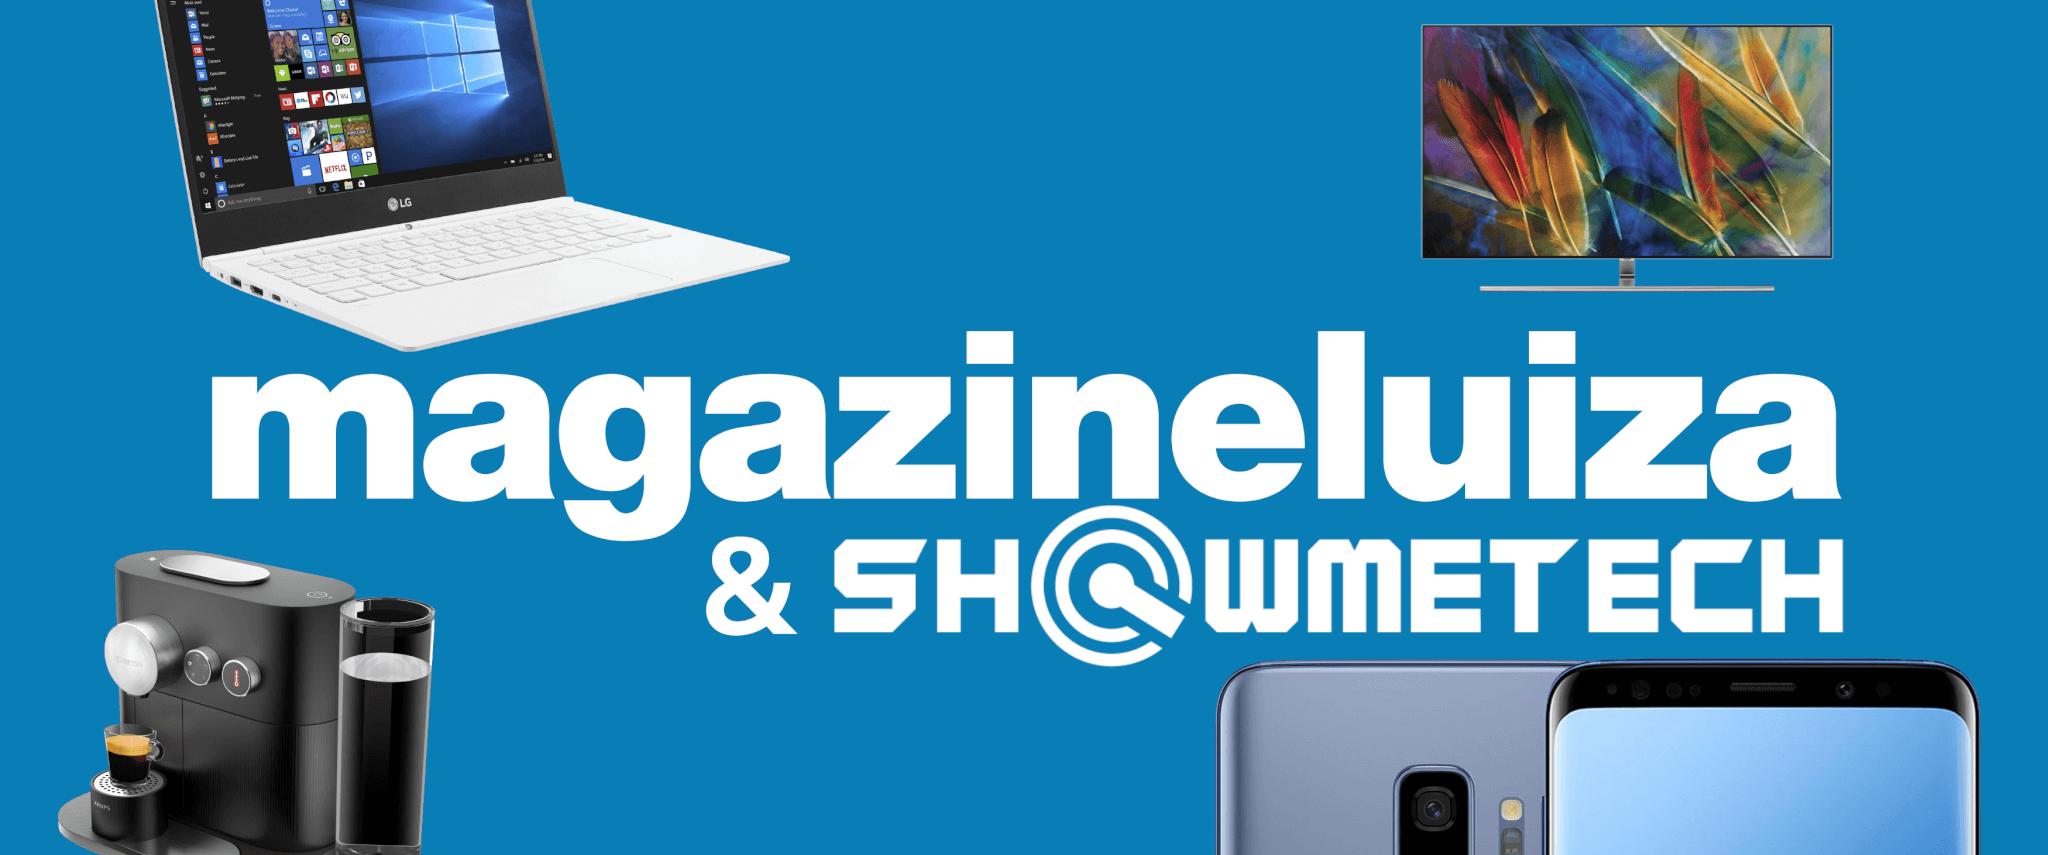 Magazine luiza showmetech loja logo